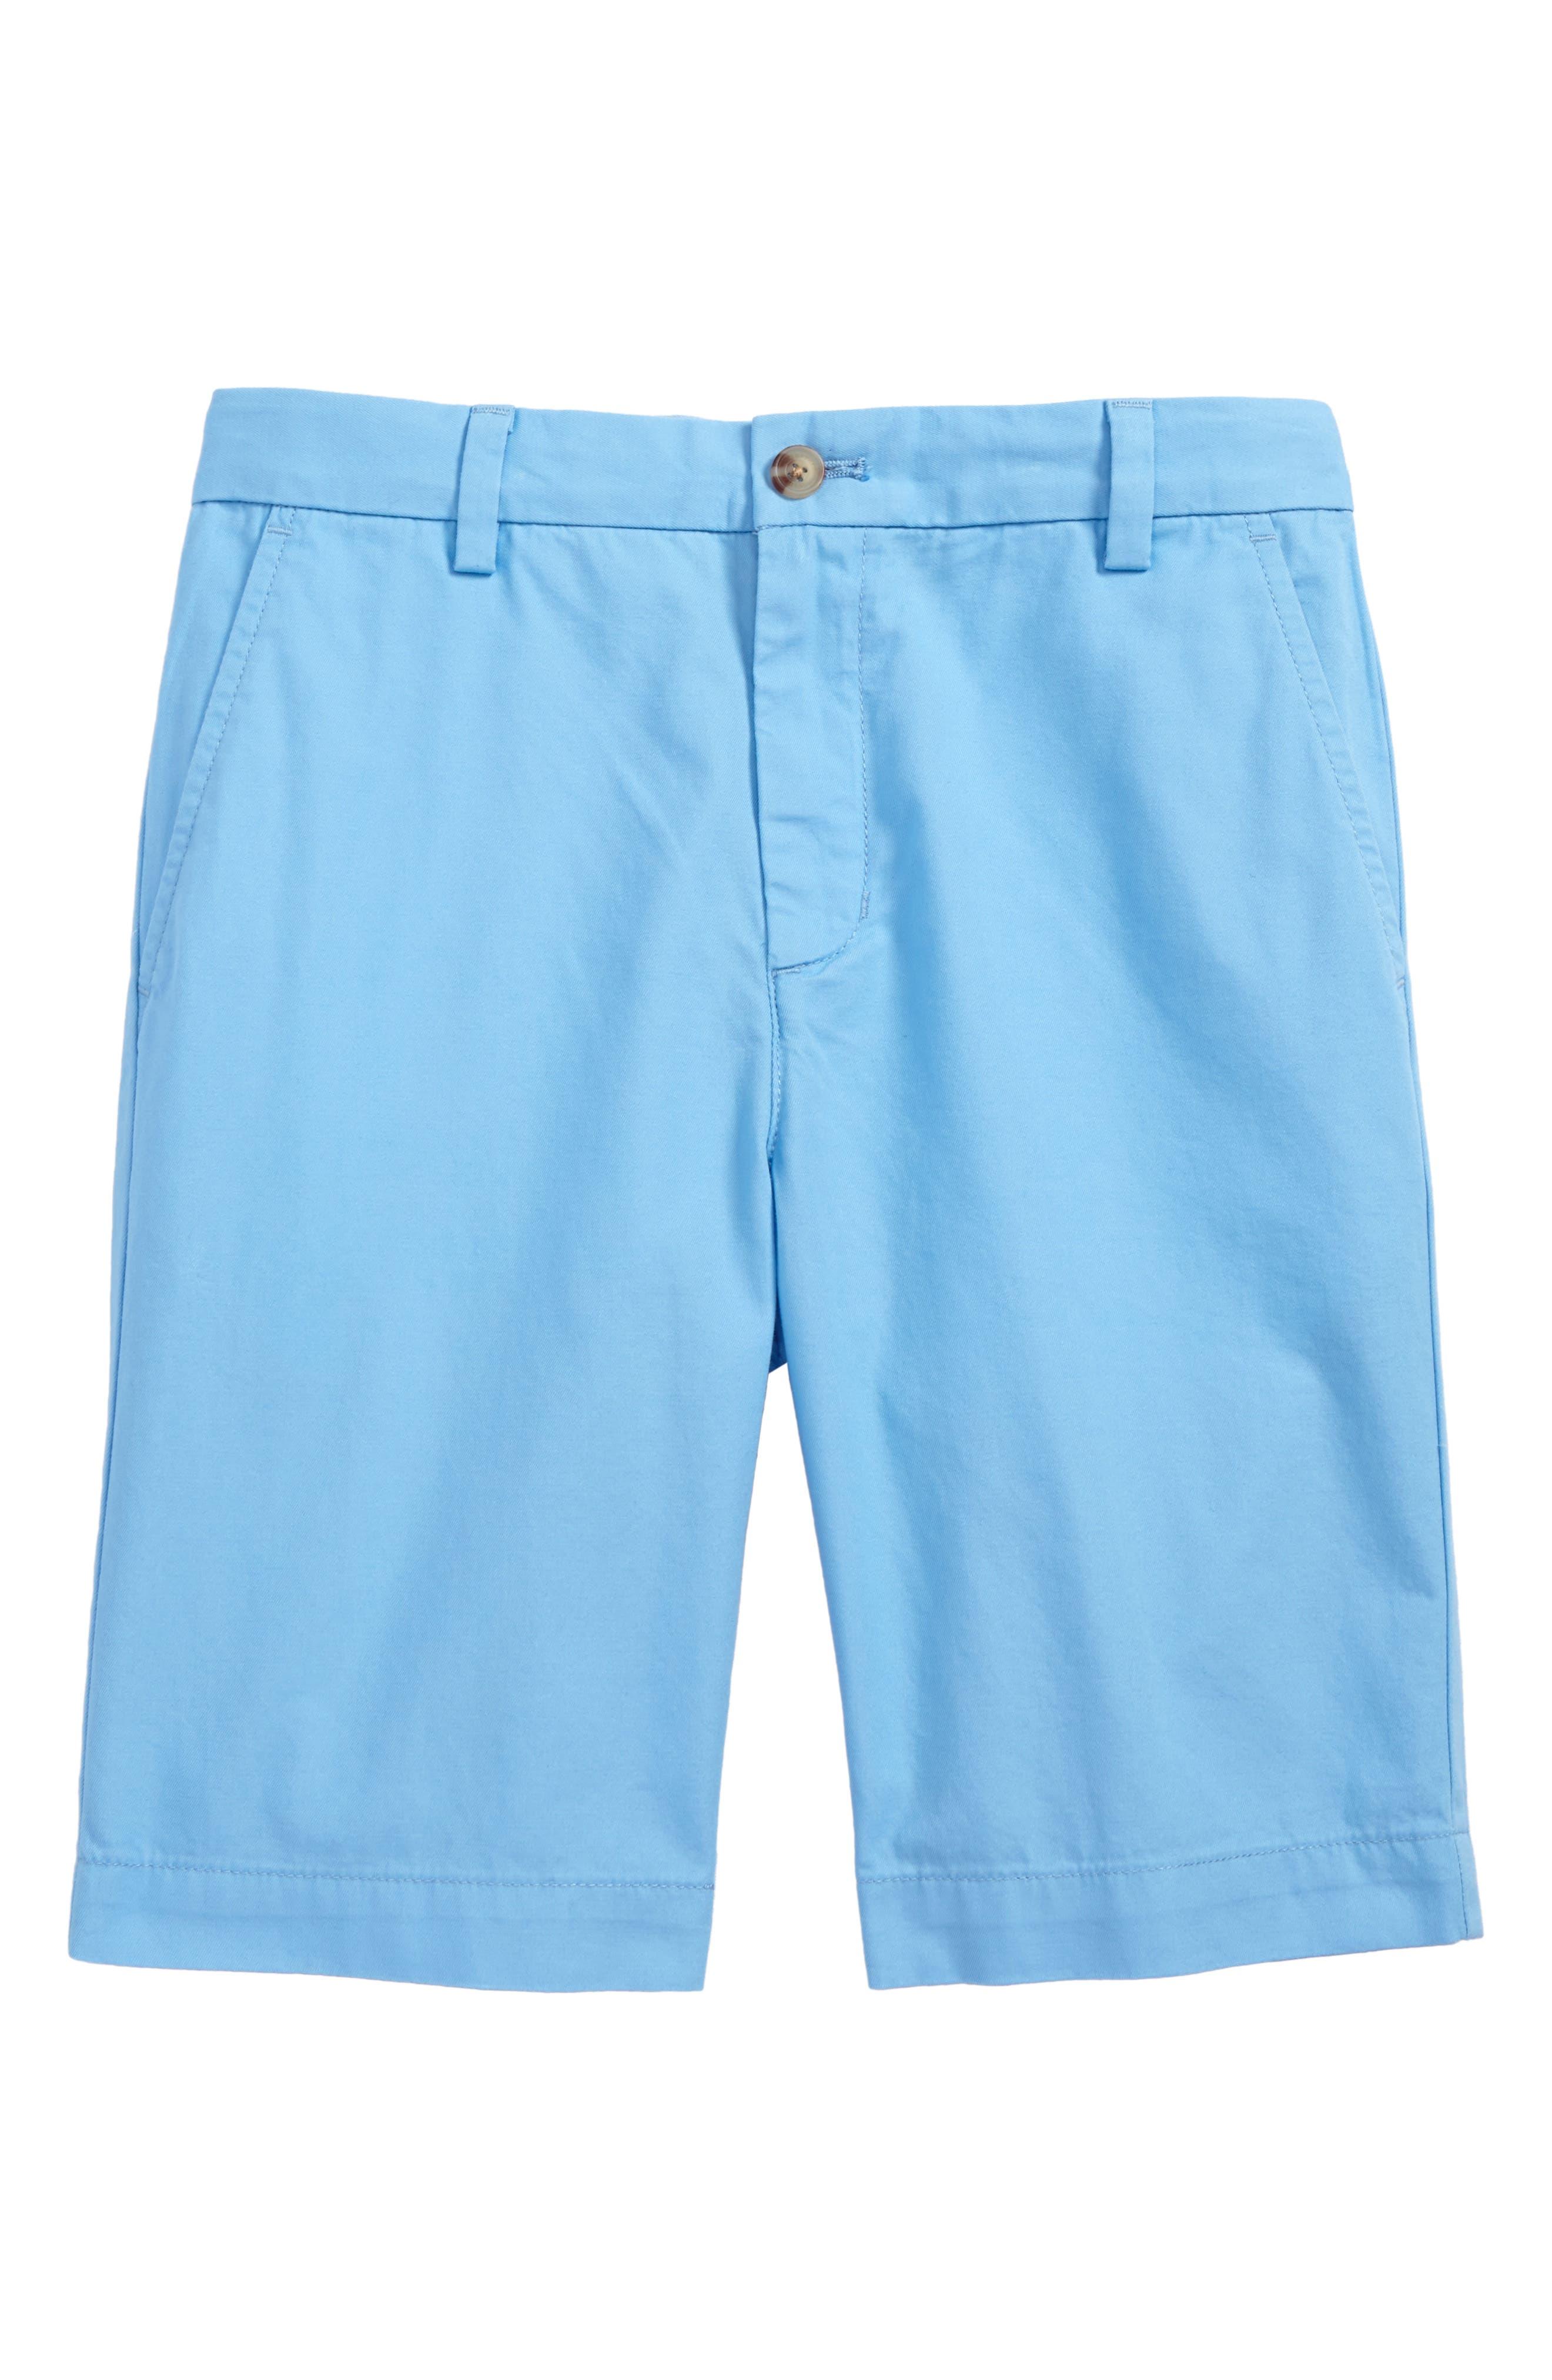 Alternate Image 1 Selected - vineyard vines Summer - Breaker Twill Shorts (Toddler Boys, Little Boys & Big Boys)